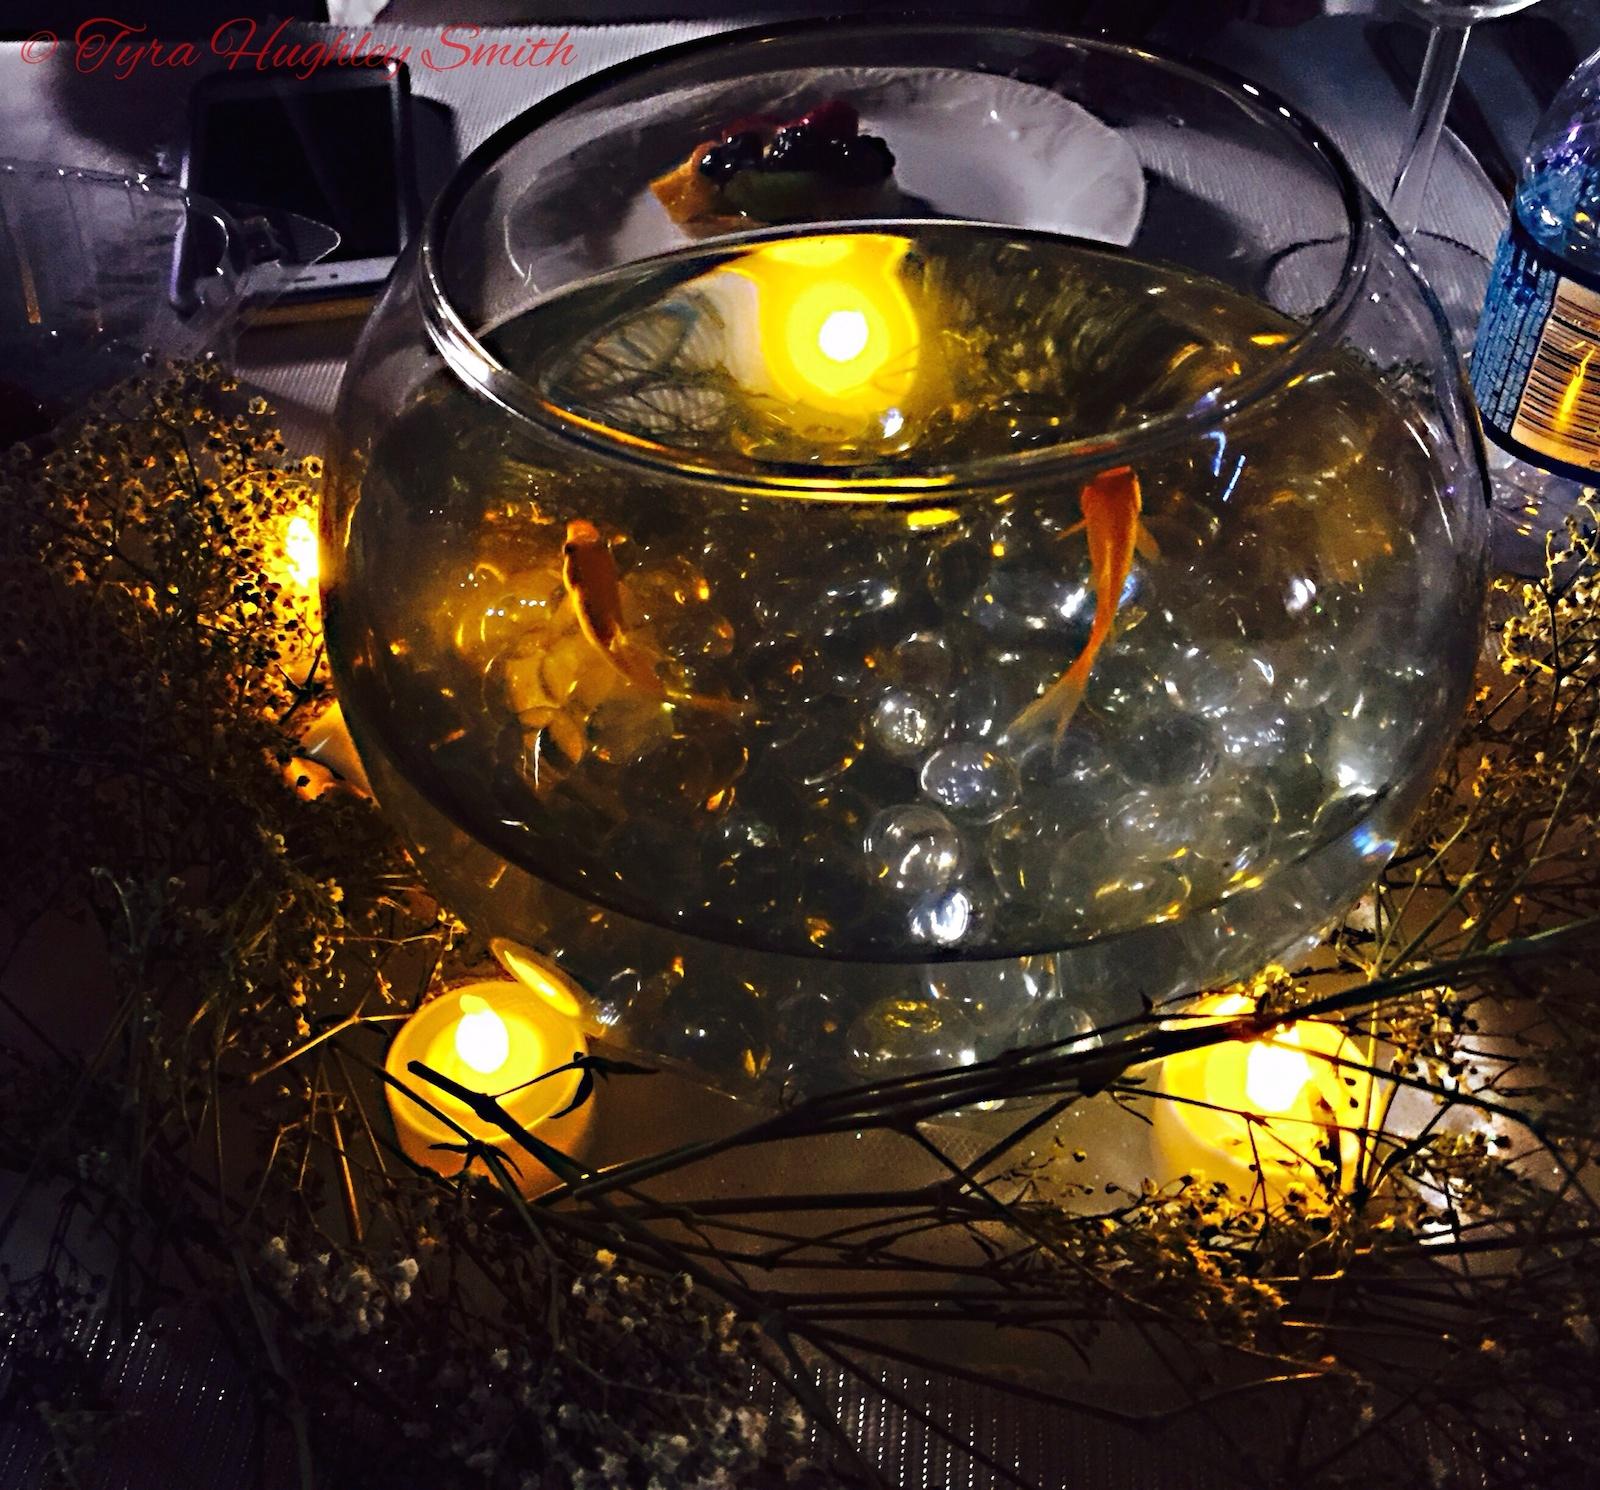 BarrisTourista-Diner en Blanc Los Angeles 2015 centerpiece fish